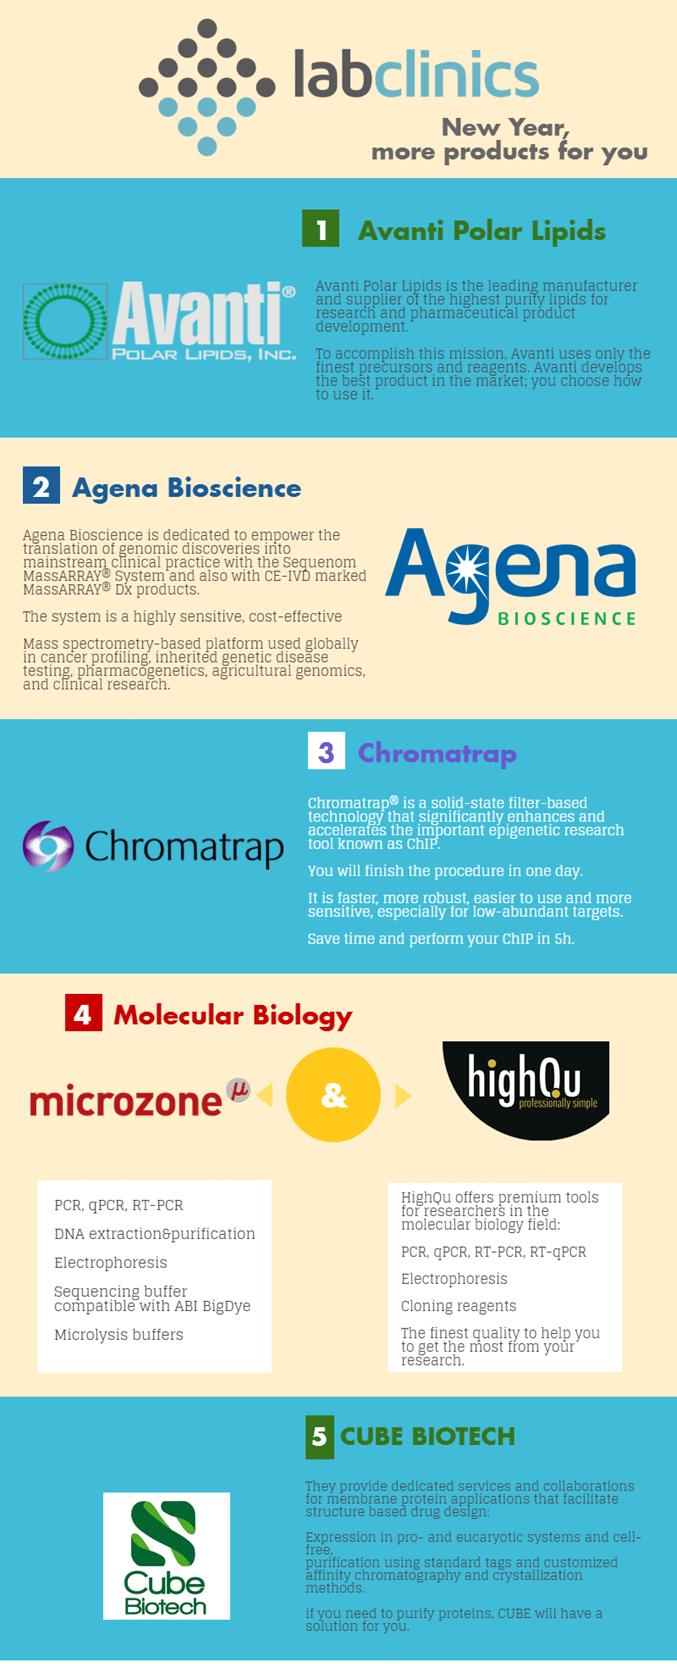 Novedades 2017 Avanti Agena Chromatrap microzone highqu cube biotech (1)